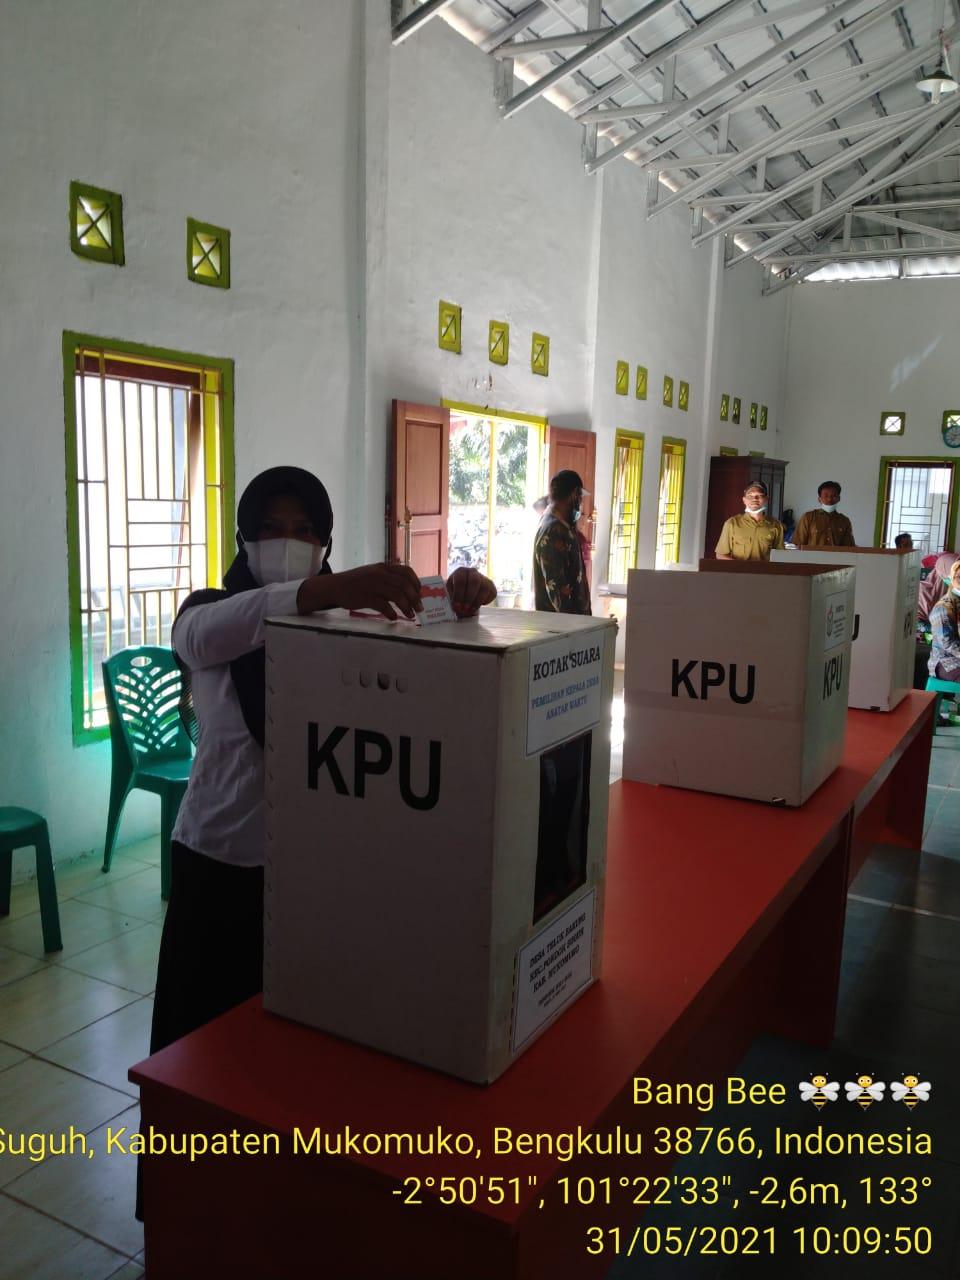 Pemilihan PAW Kepala Desa Teluk Bakung, Polsek Pondok Suguh Gelar Pengamanan dan Himbauan Prokes